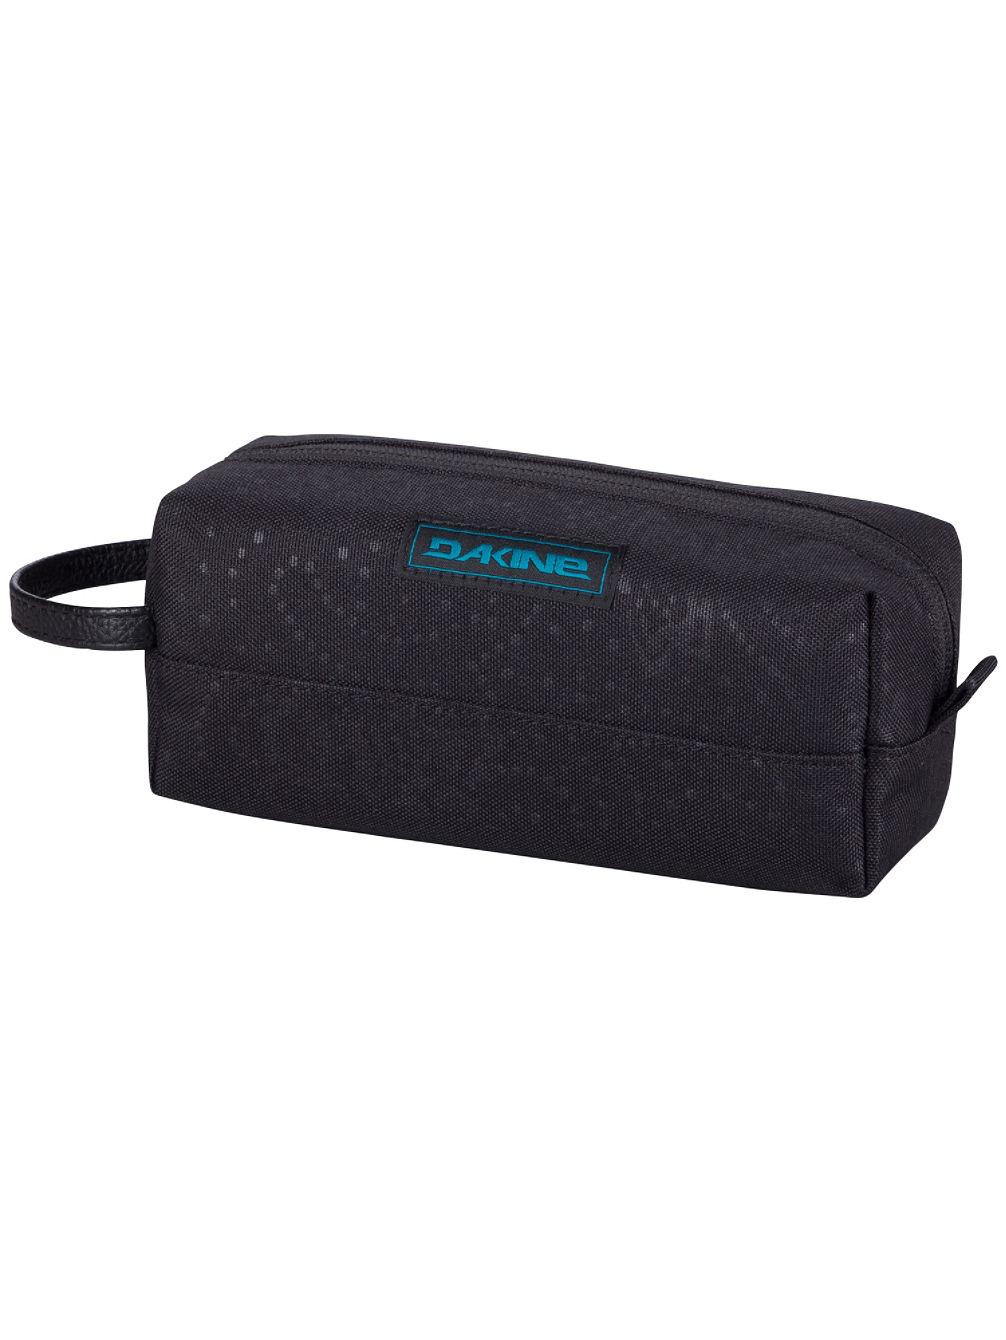 accessory-case-bag